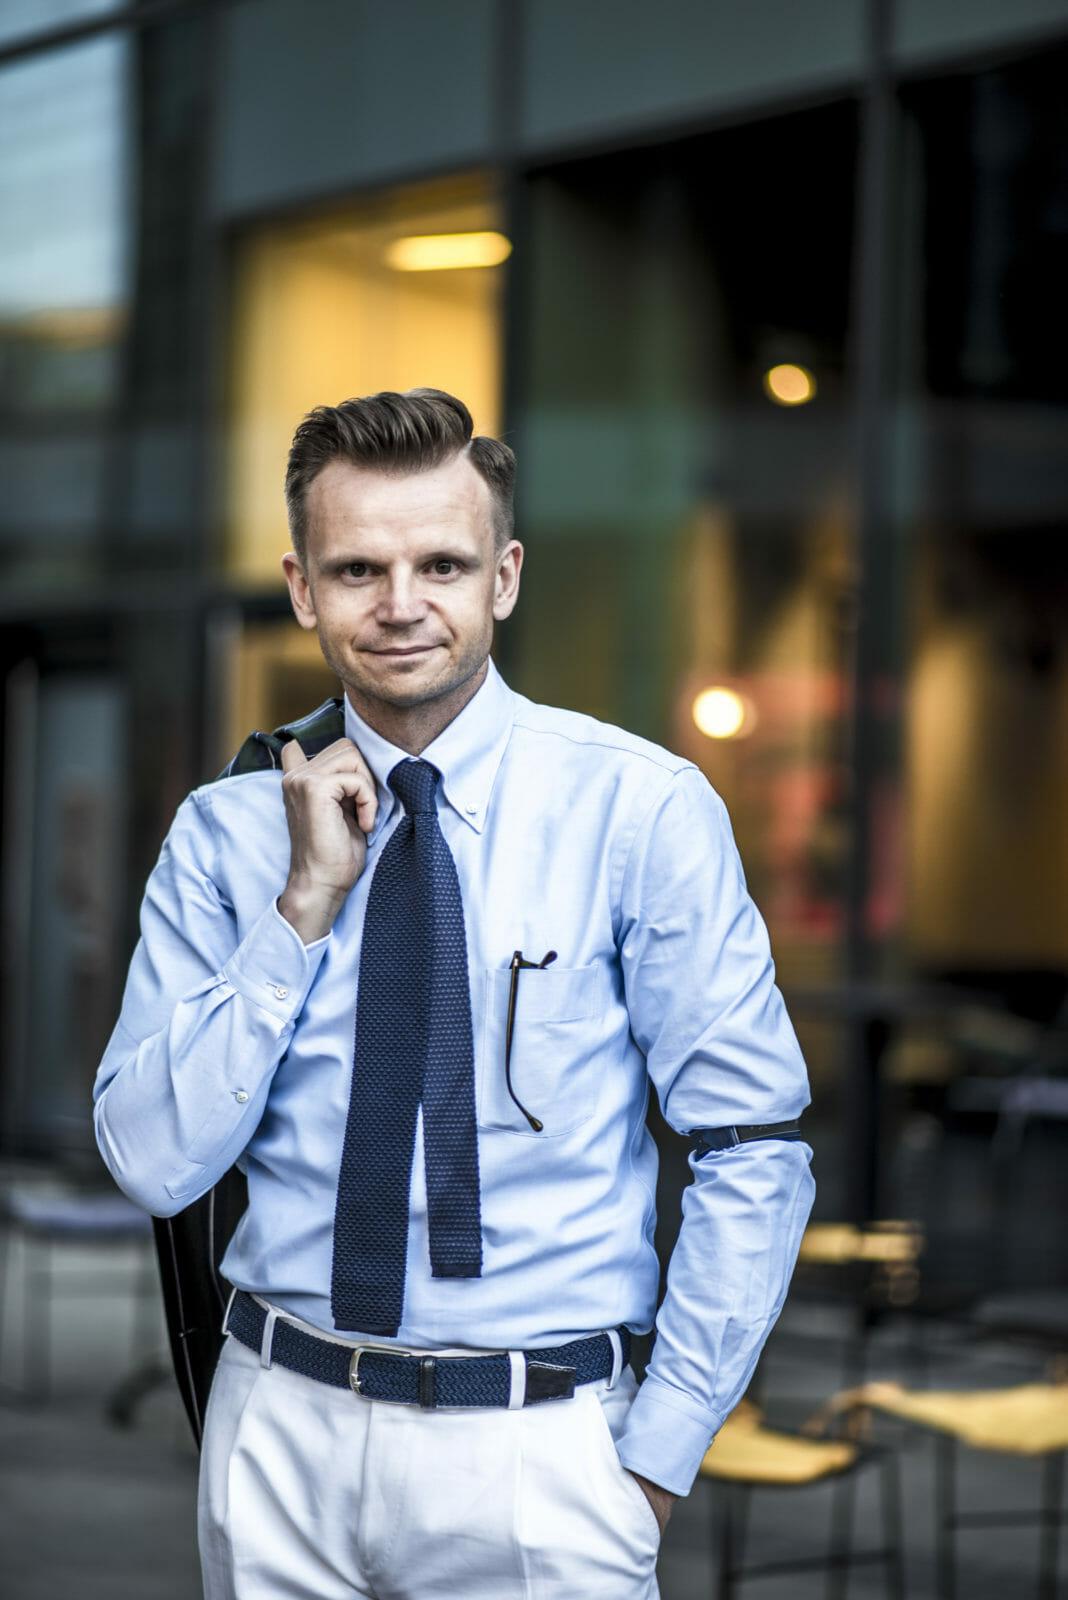 błękitna koszula z krawatem